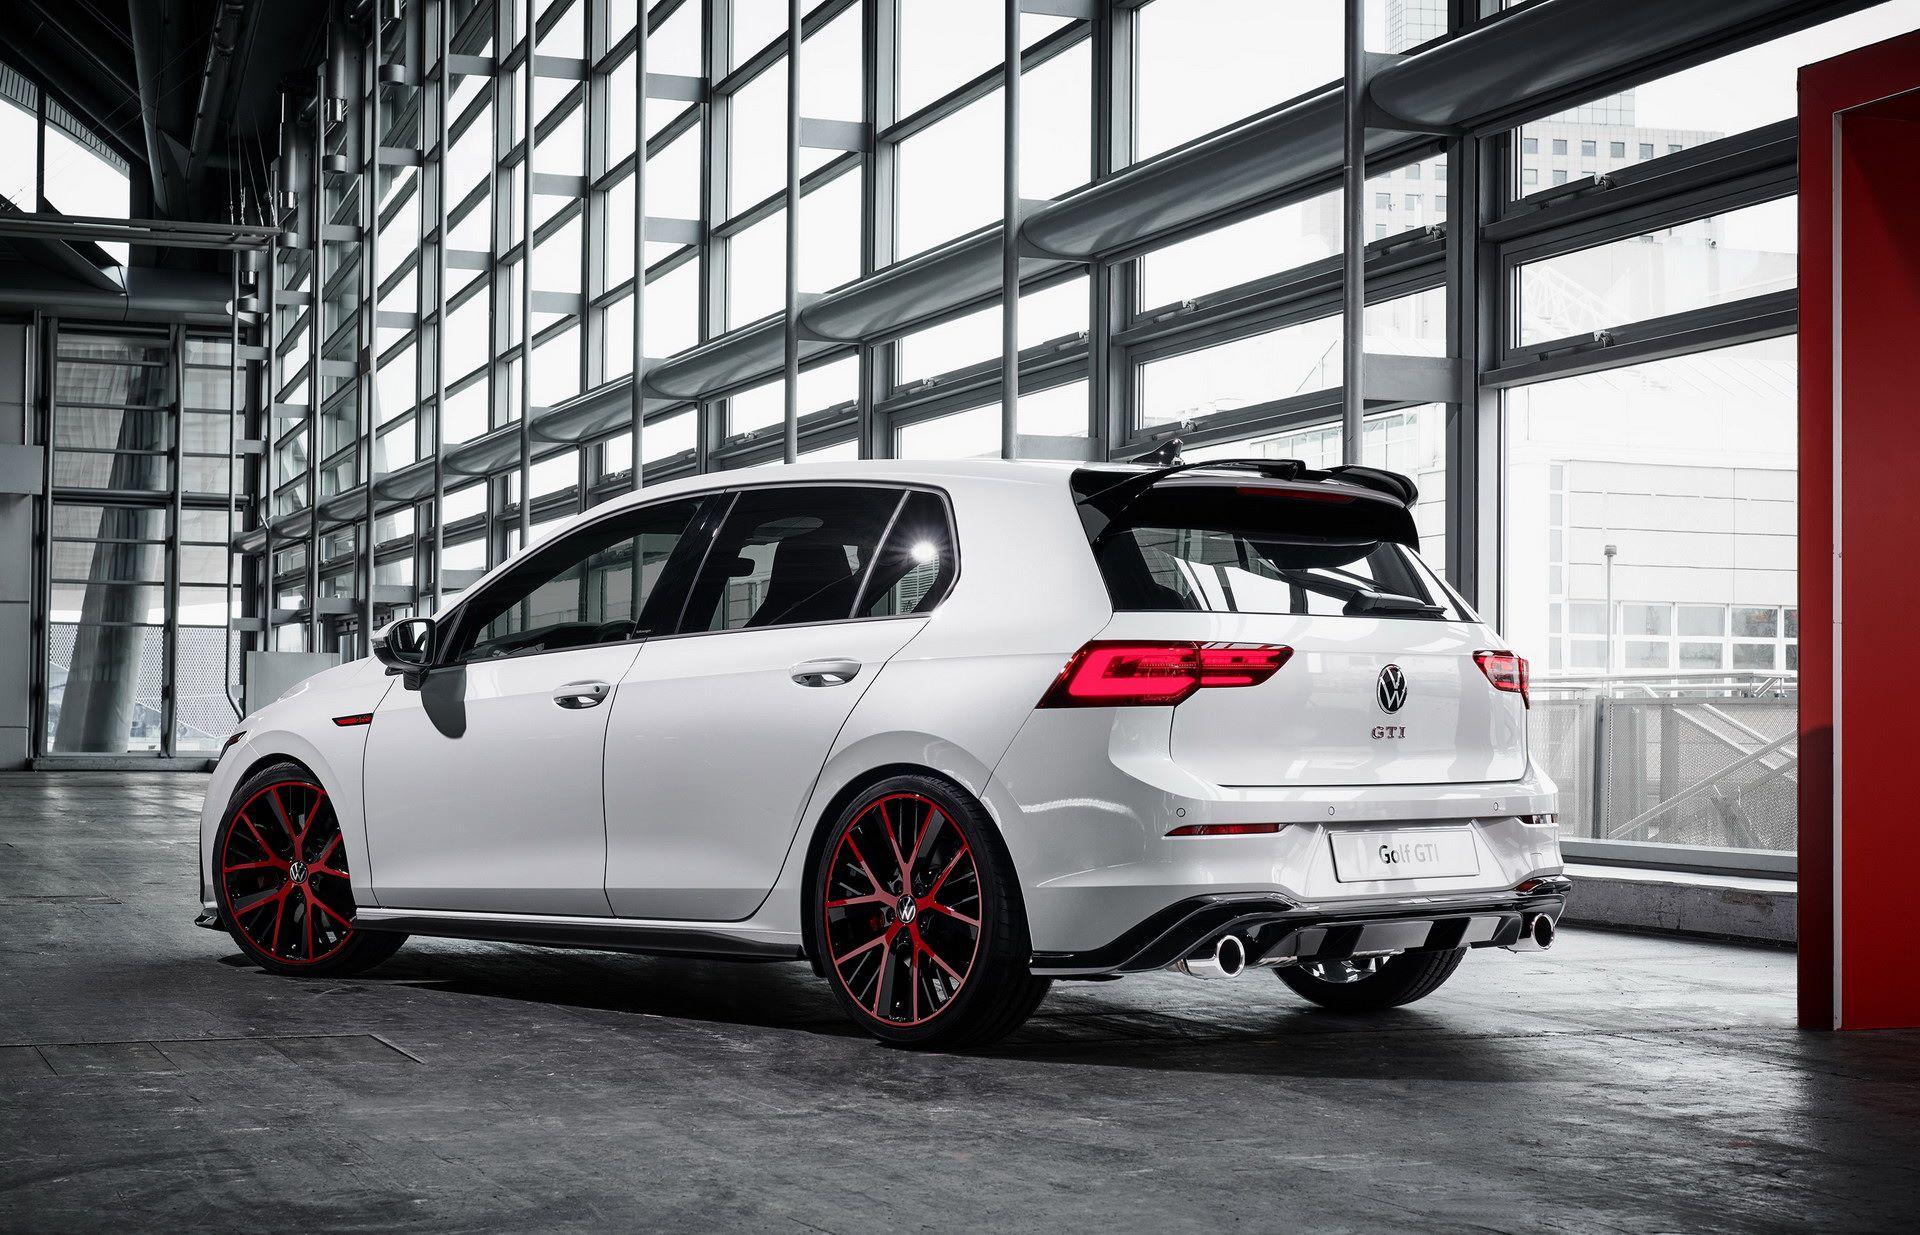 VW-Golf-GTI-By-Oettinger-5